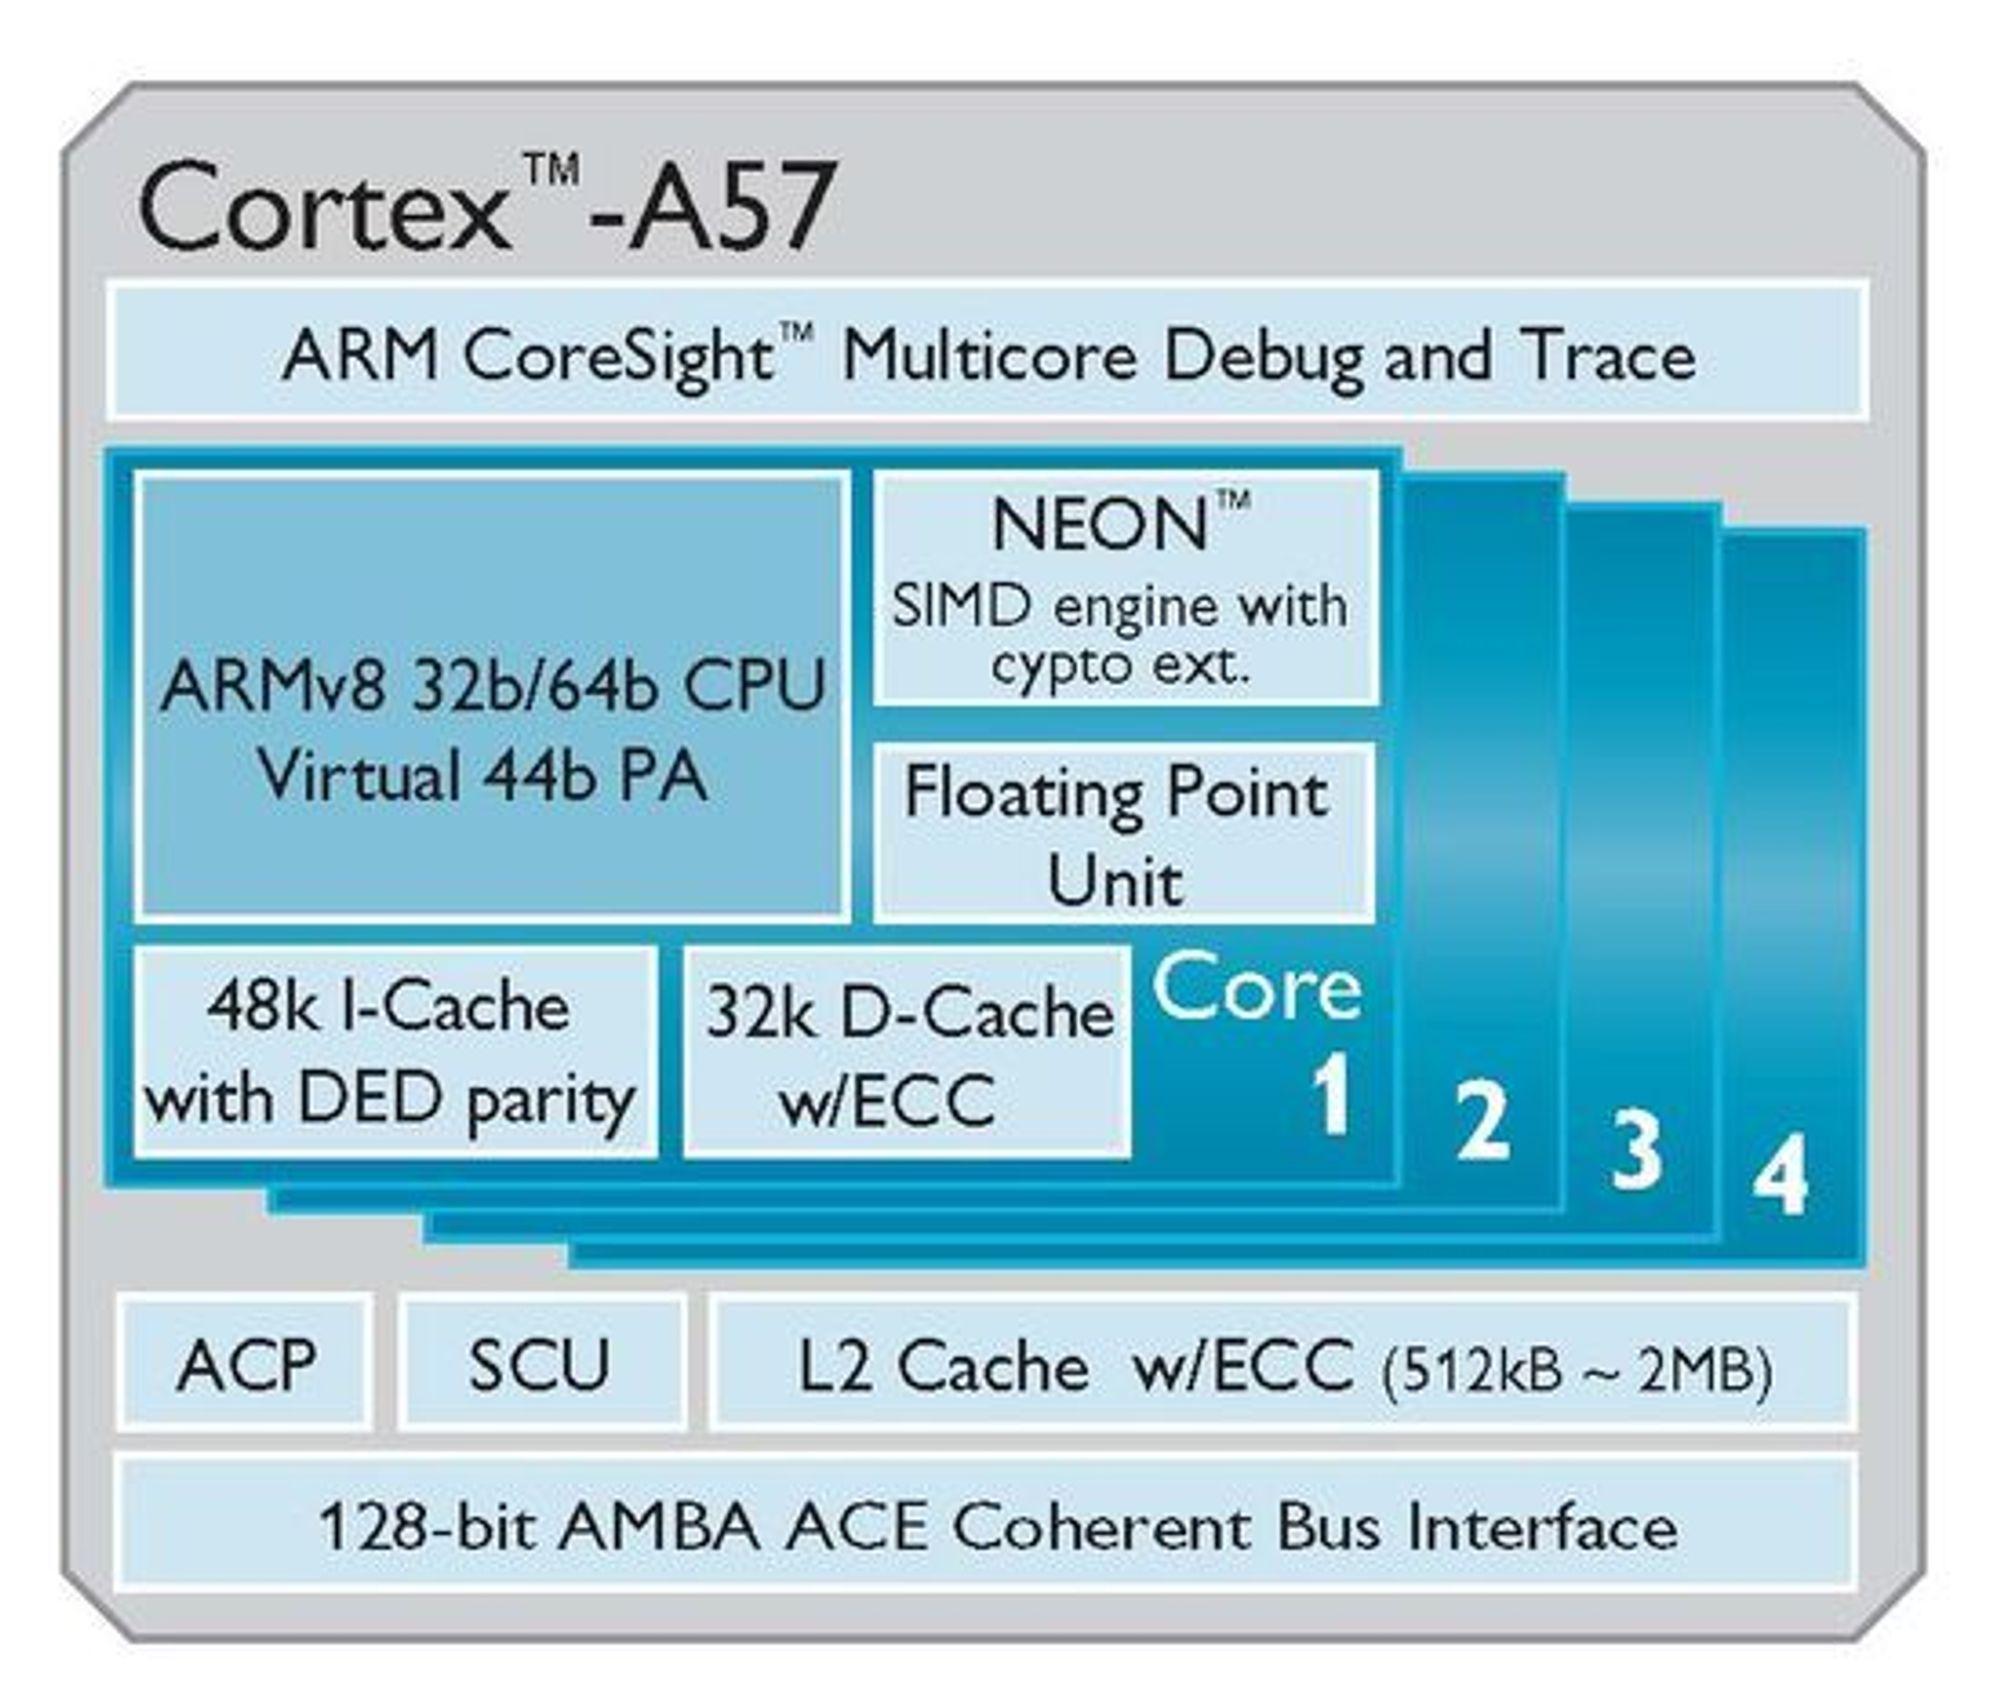 Blokkdiagram over oppbygningen av Cortex-A57.